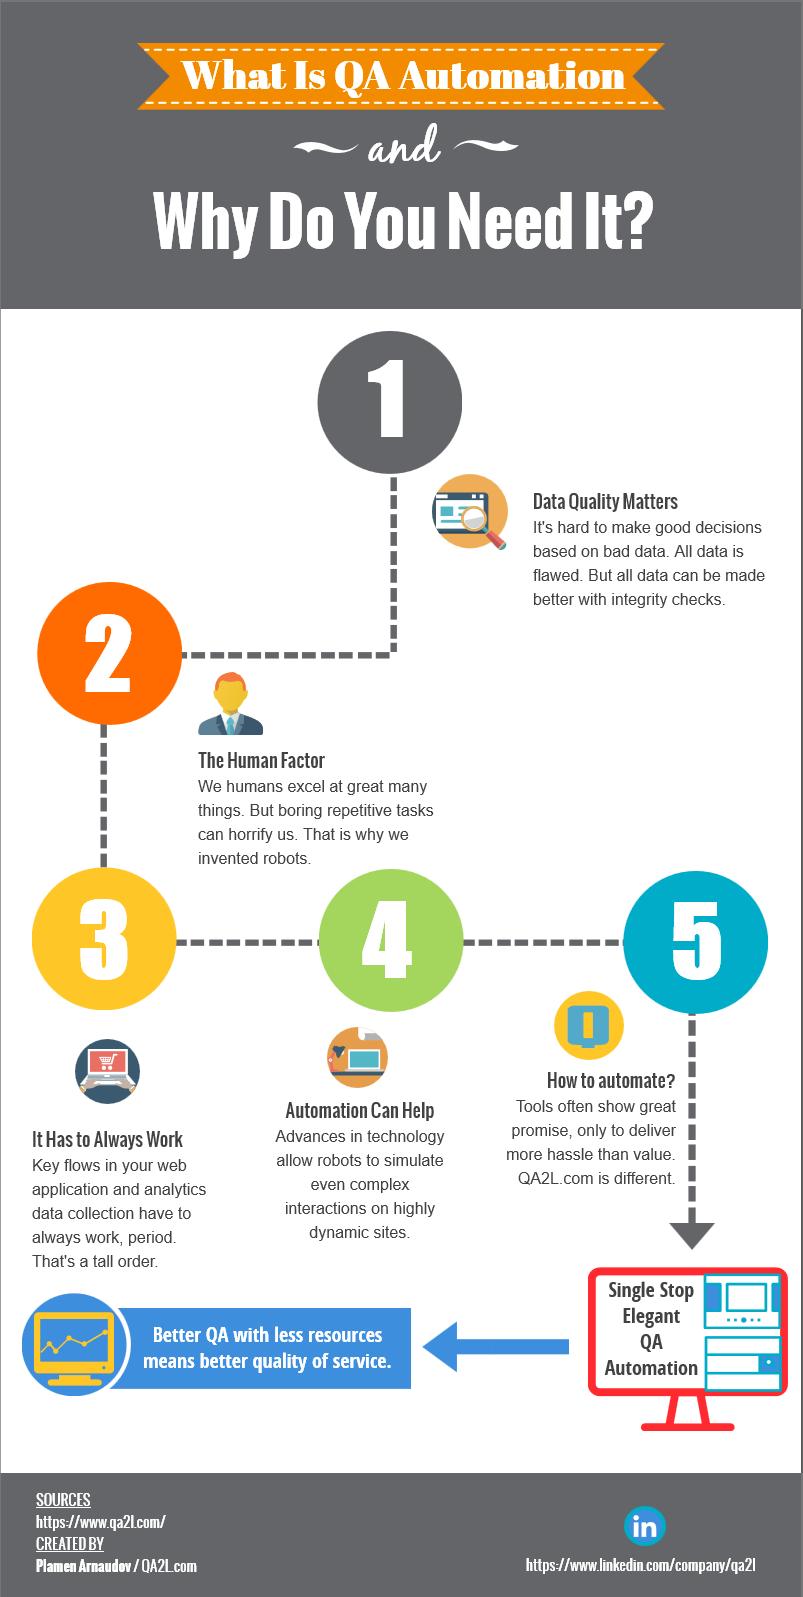 QA2L Infographic